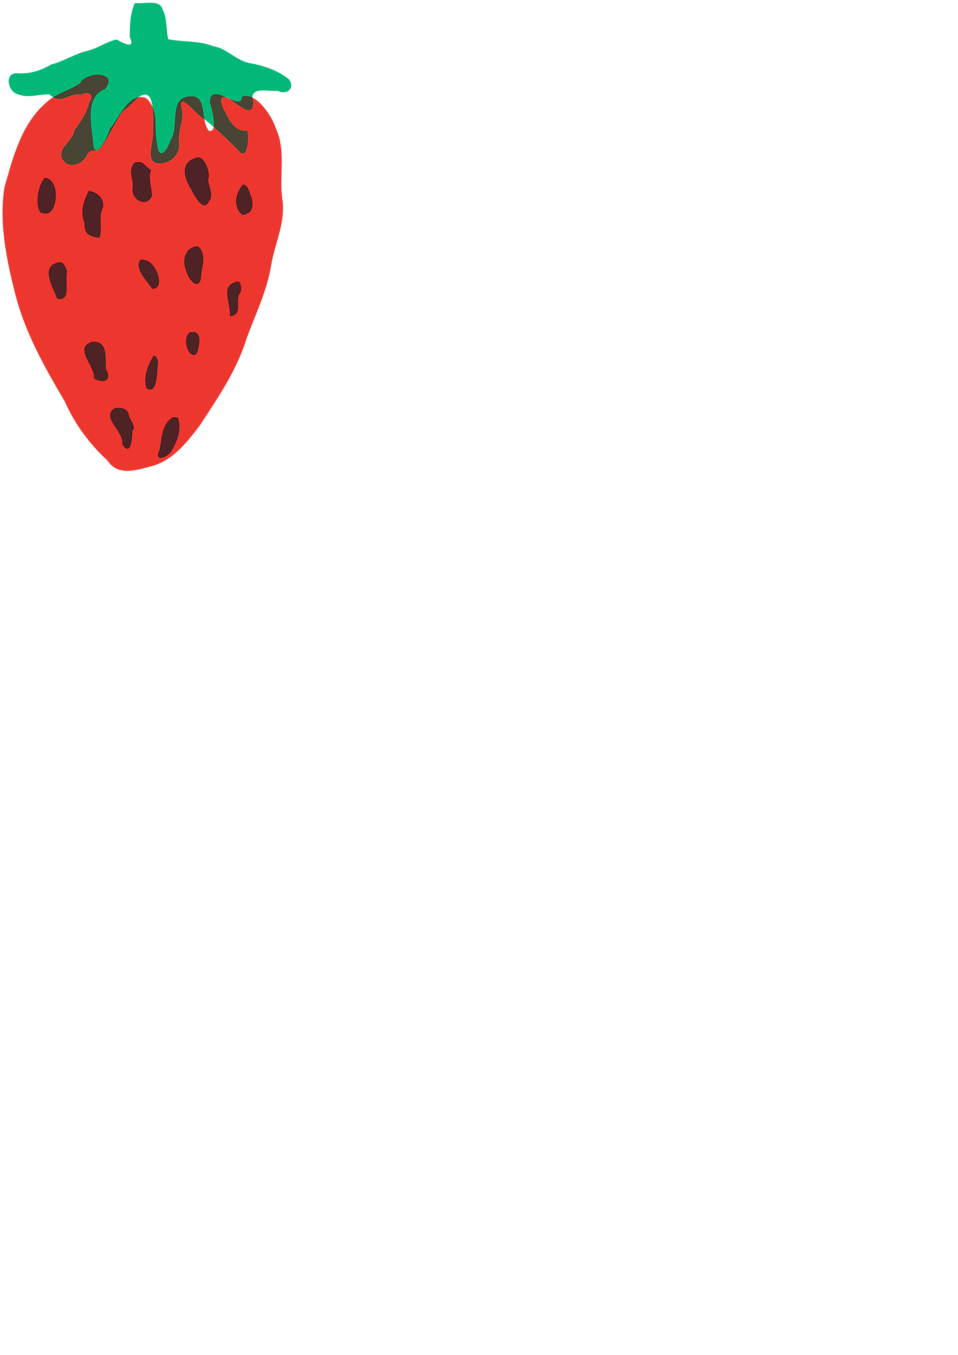 jpg free stock Strawberry